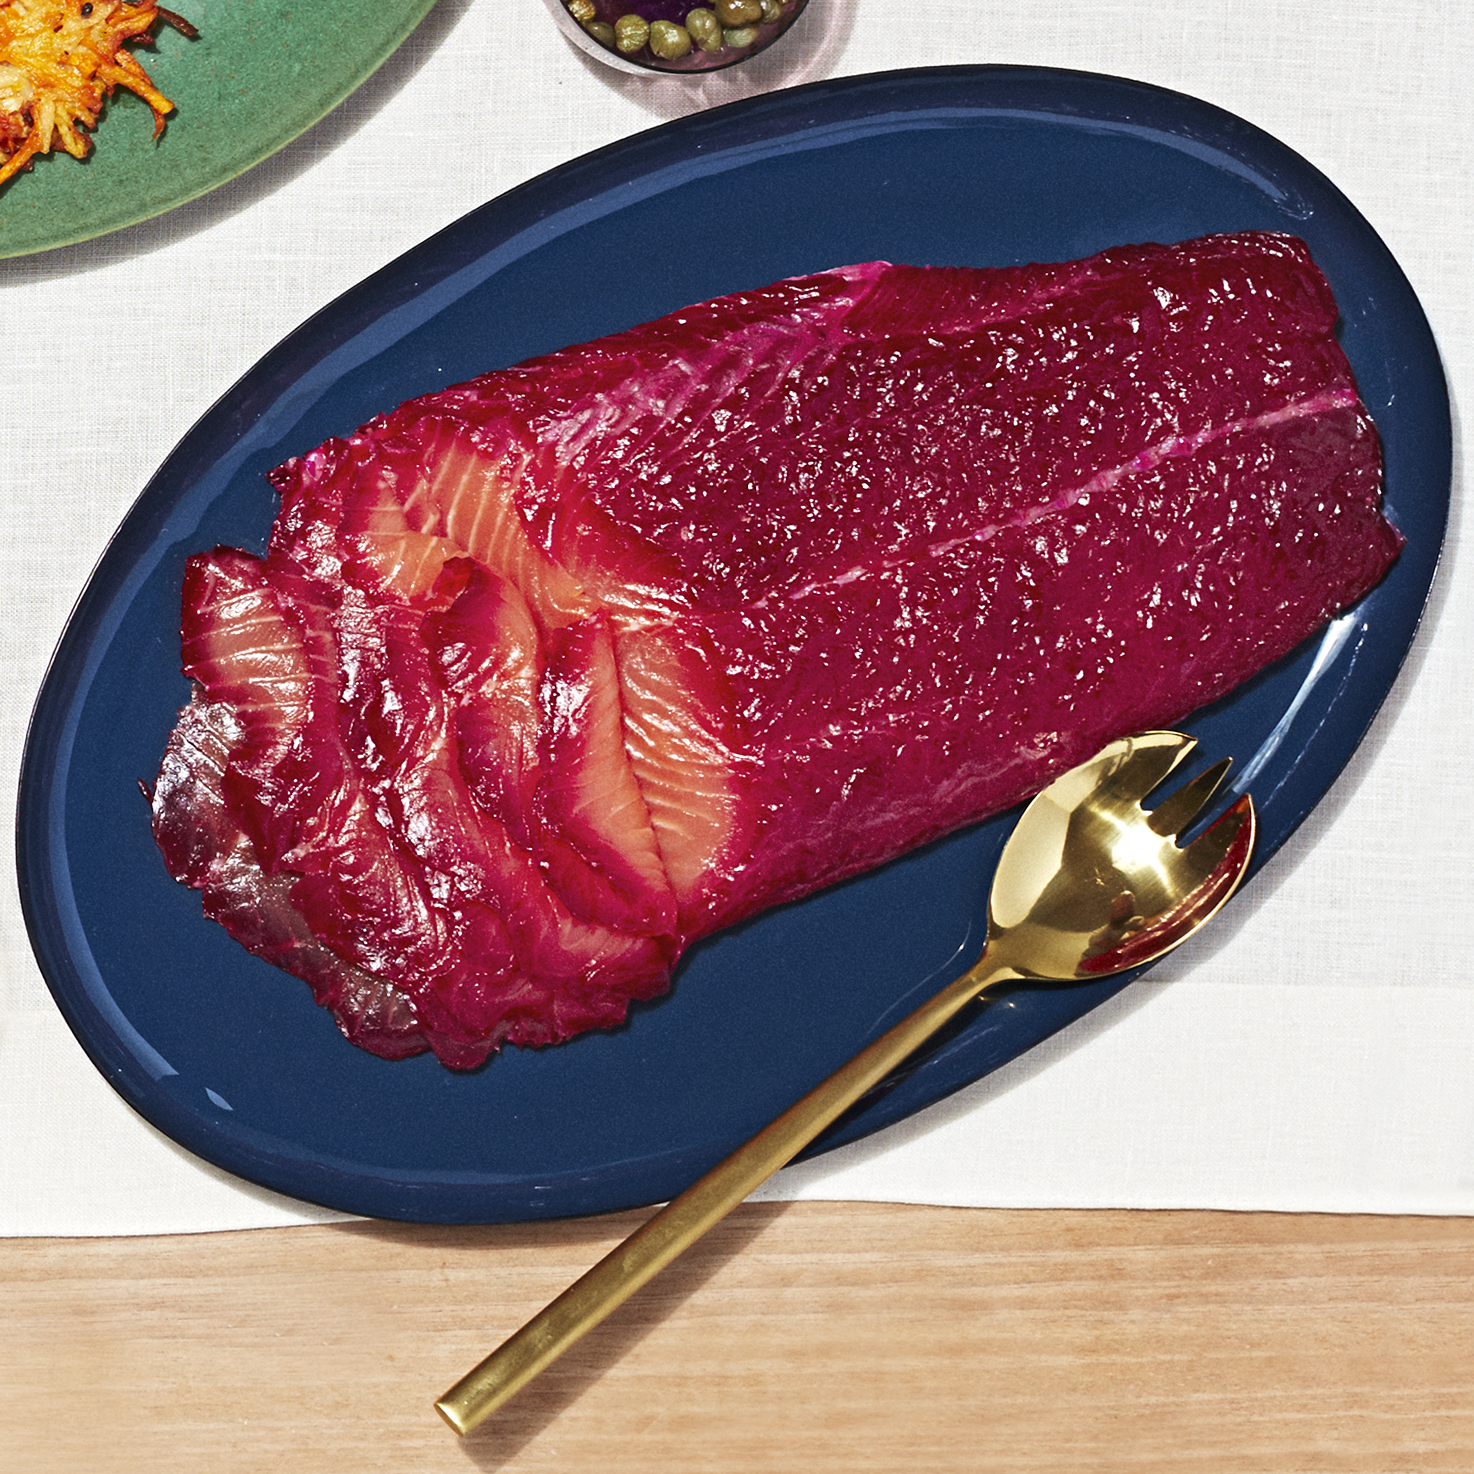 Beet-Cured Salmon with Lemon & Fennel